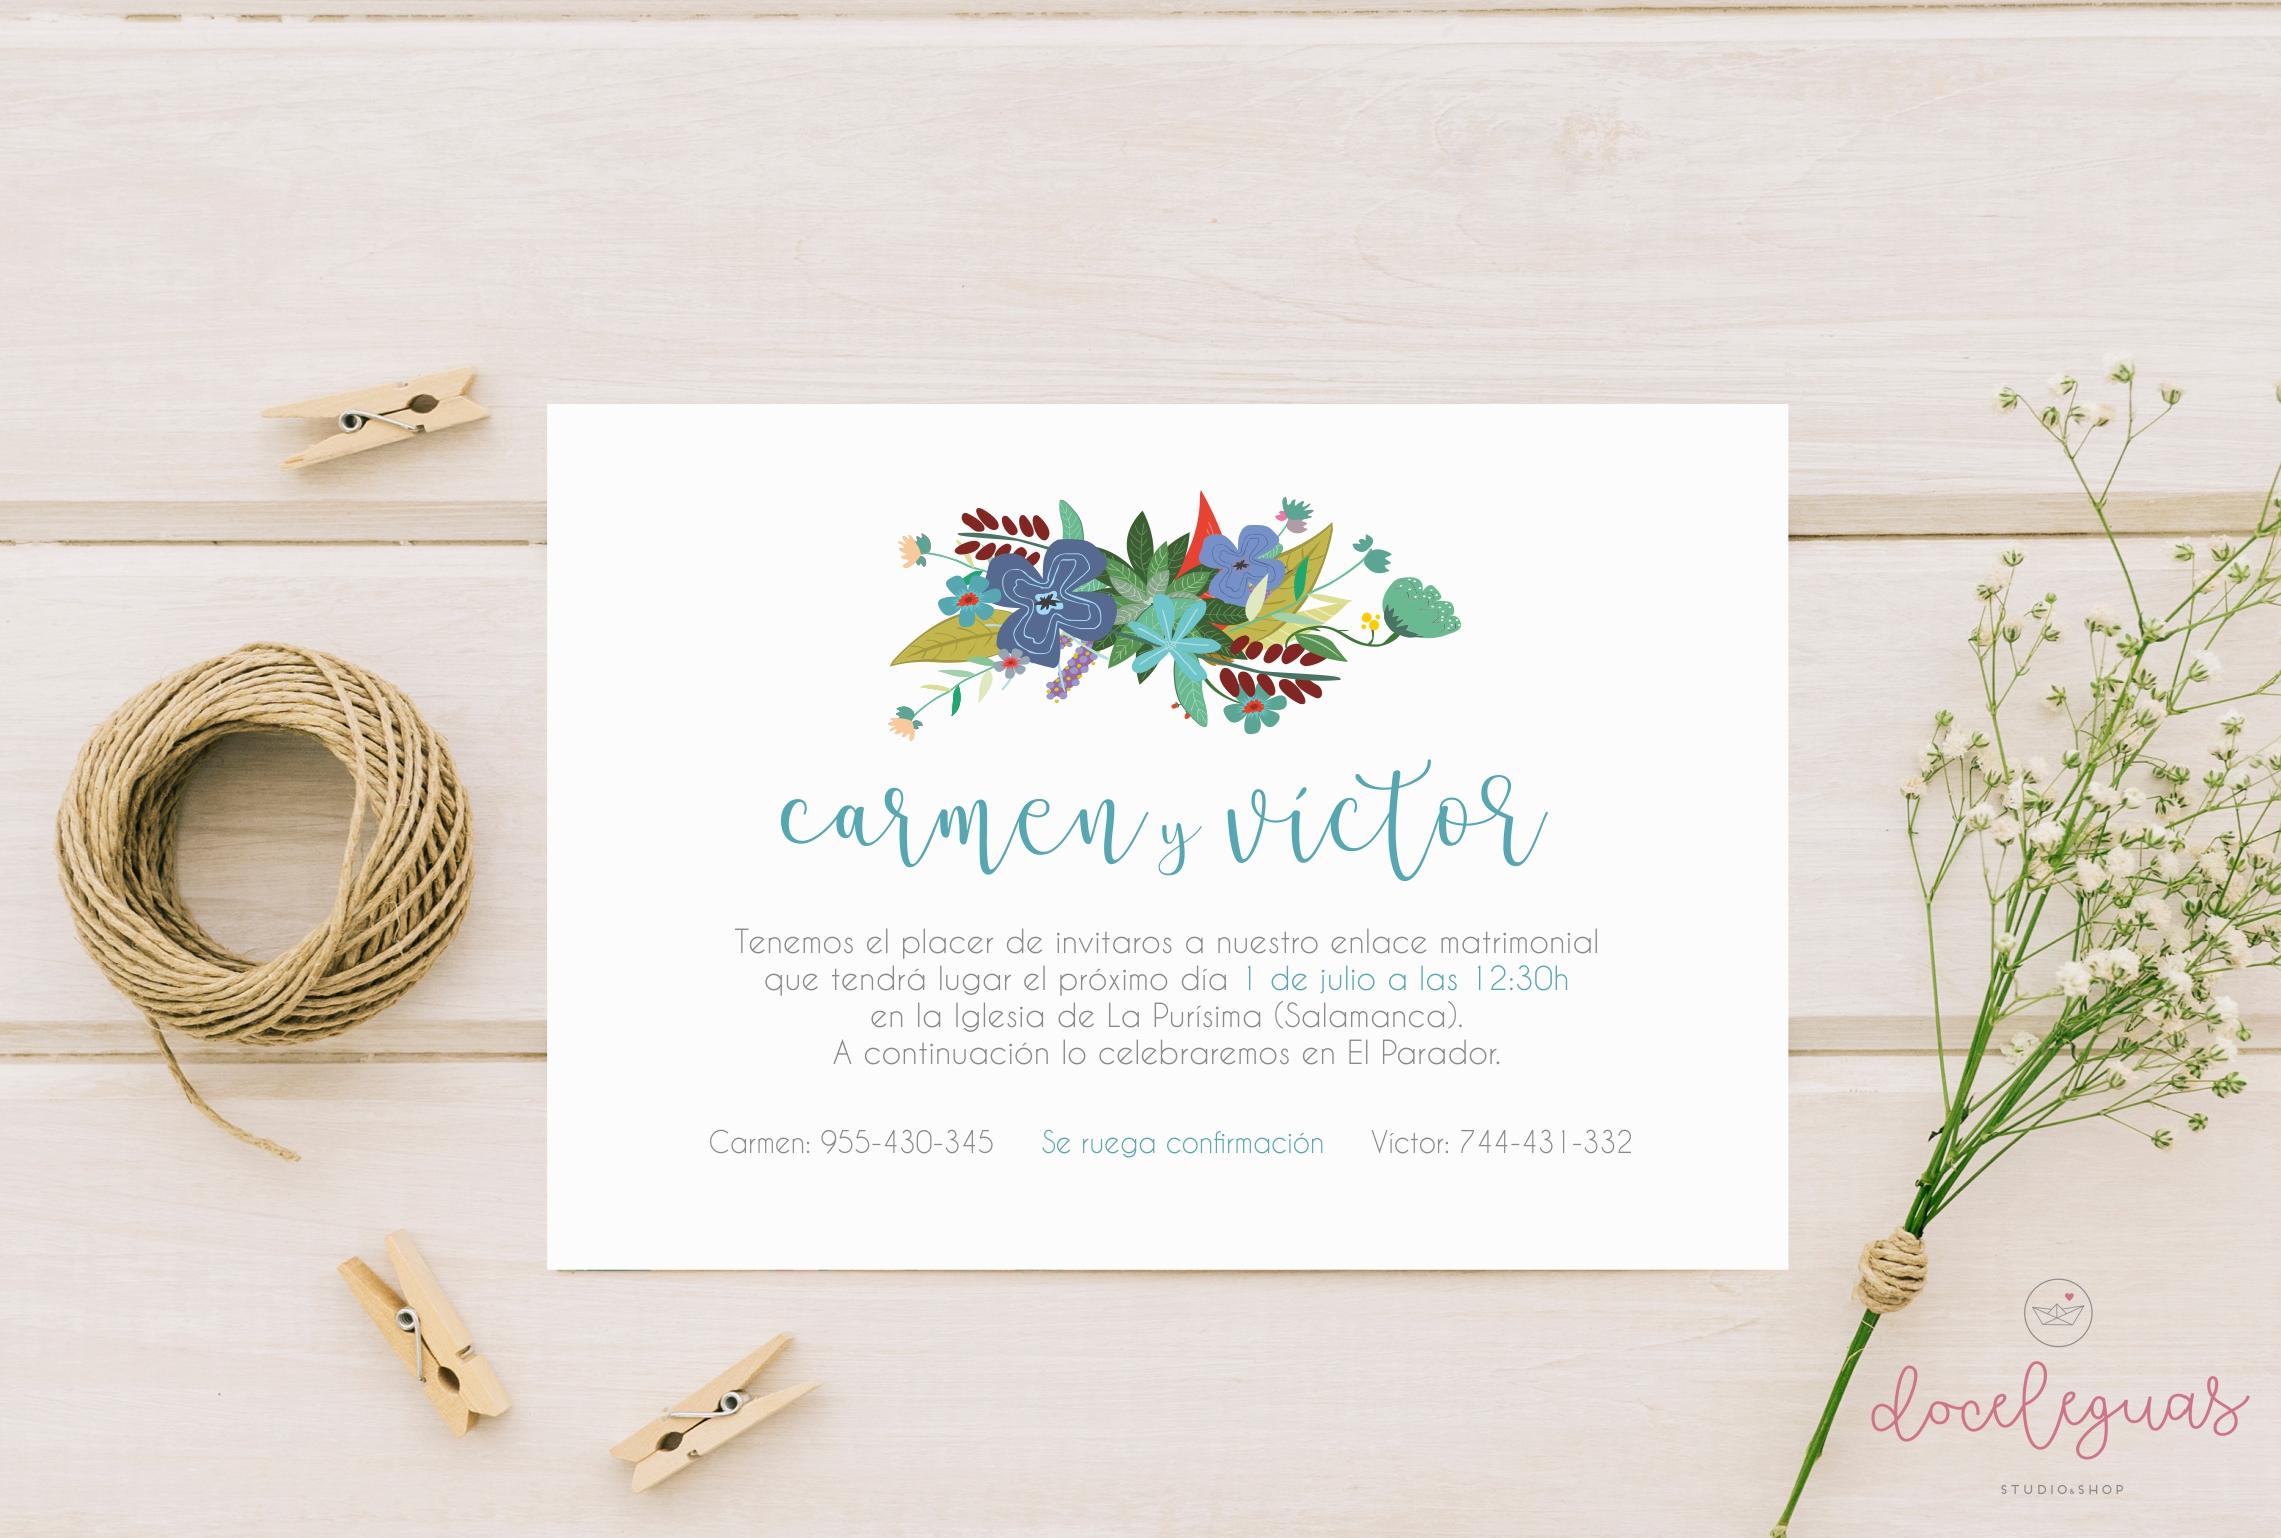 Invitaci n de boda floral doce leguas - Detalles para una boda perfecta ...